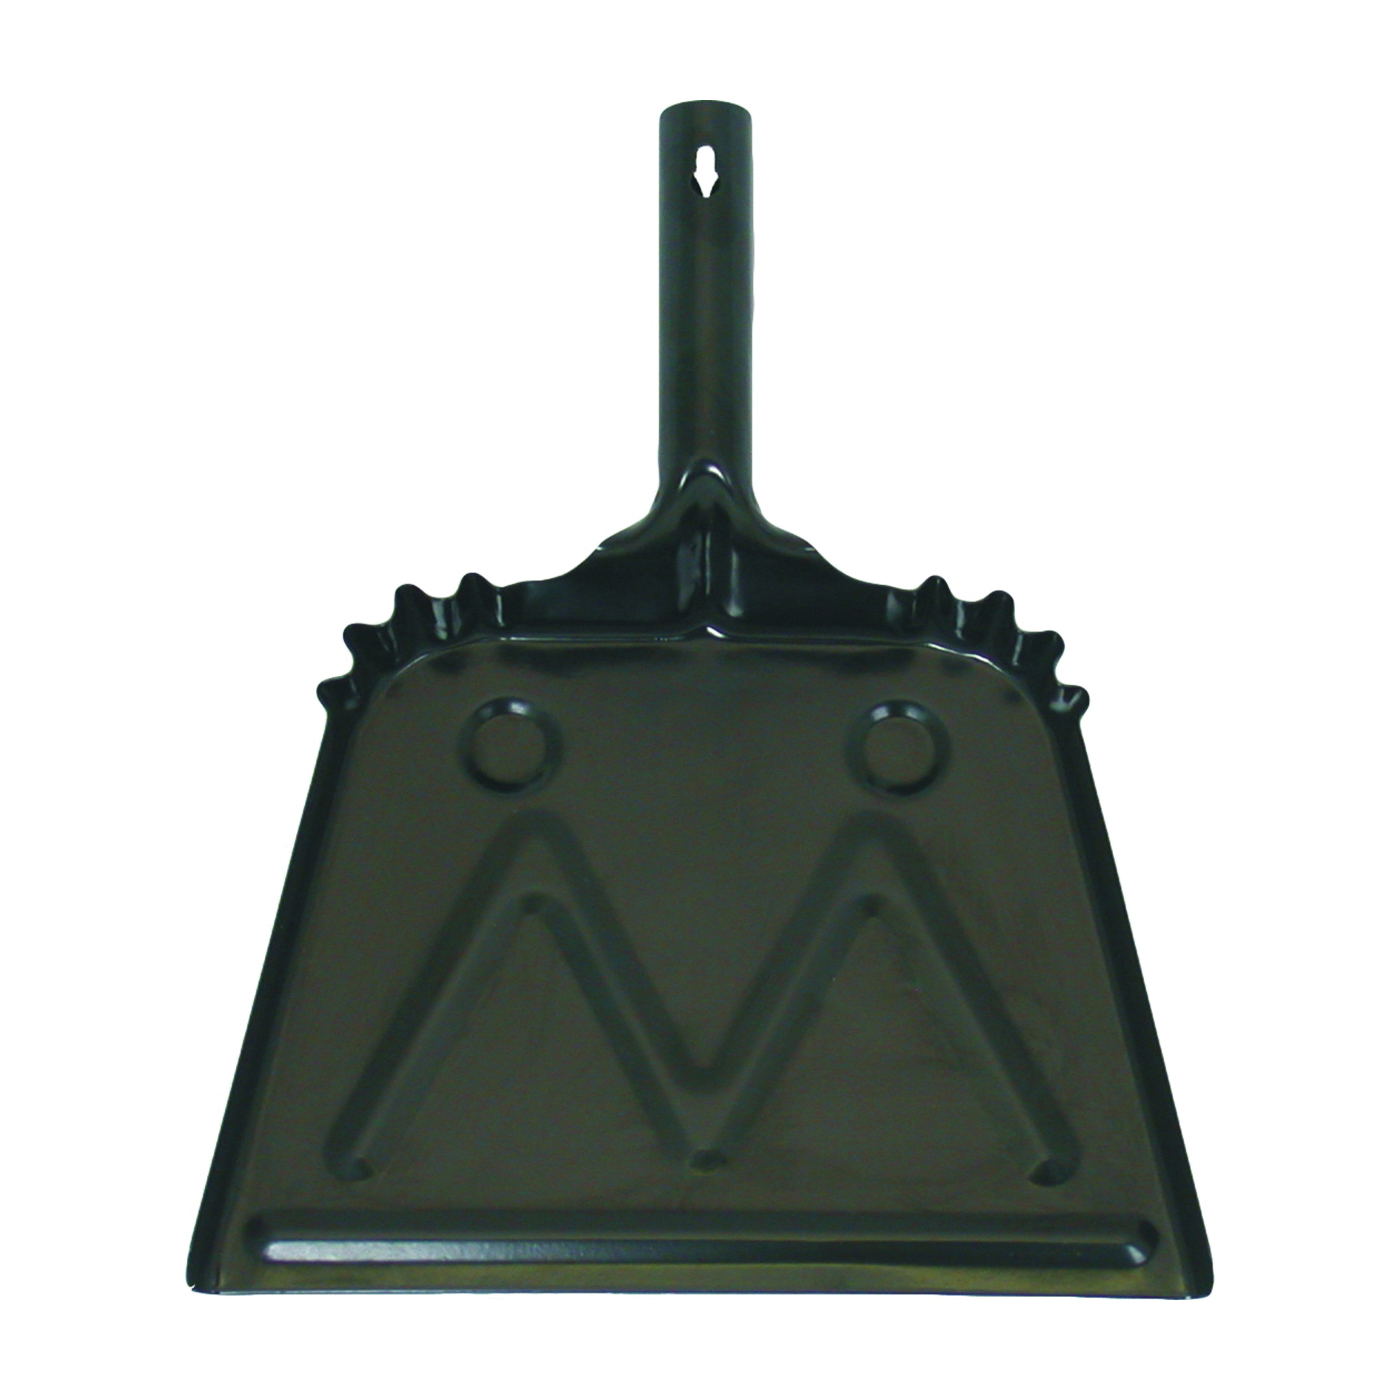 Picture of BIRDWELL 151-12 Metal Dustpan, 11-1/2 in W, Metal